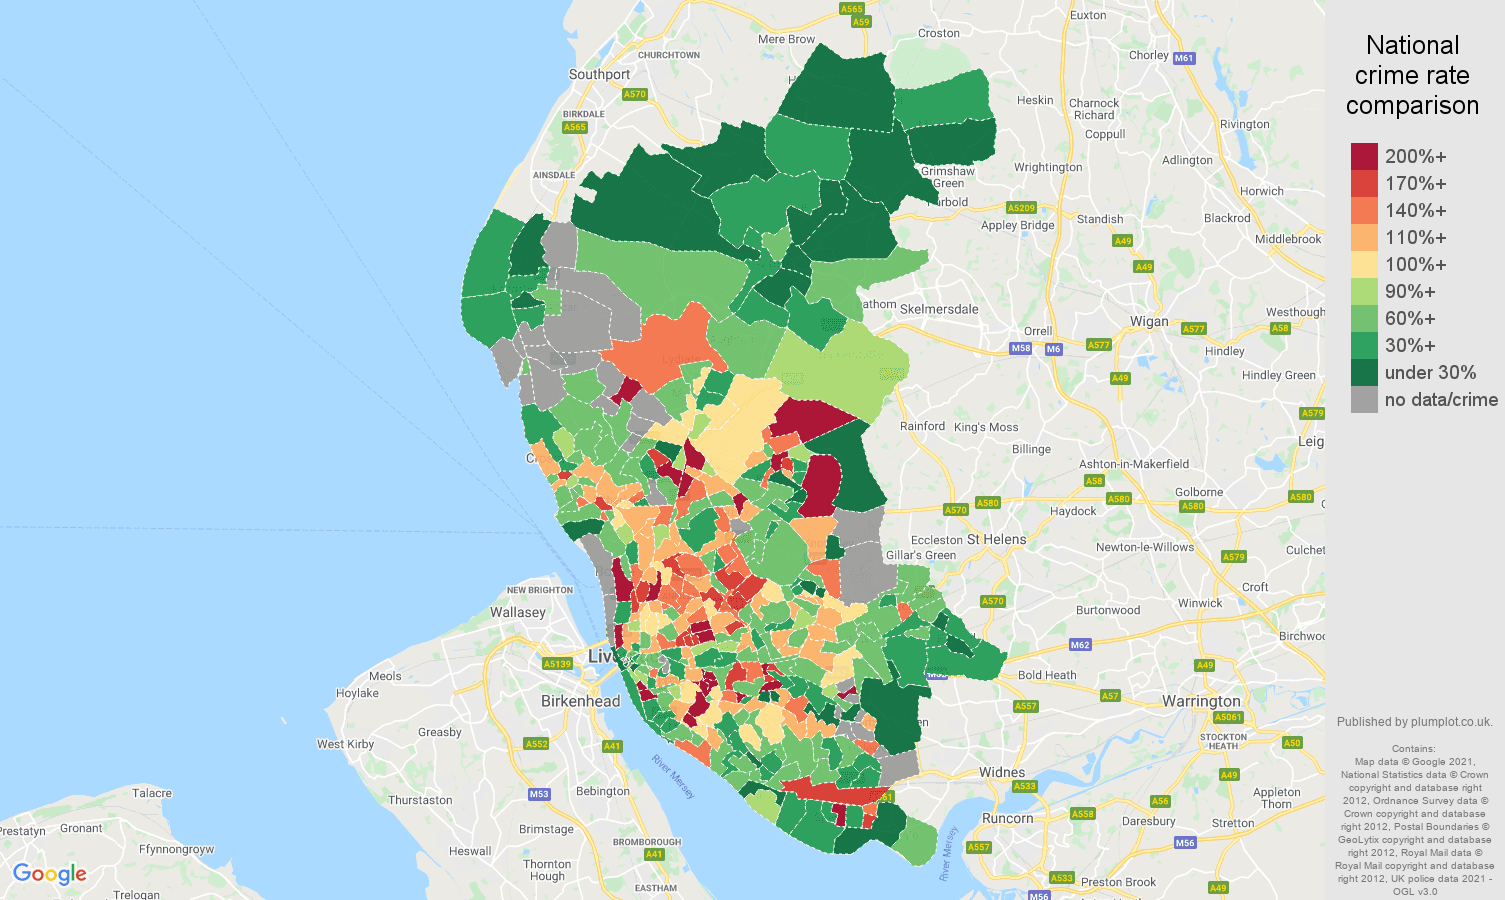 Liverpool vehicle crime rate comparison map